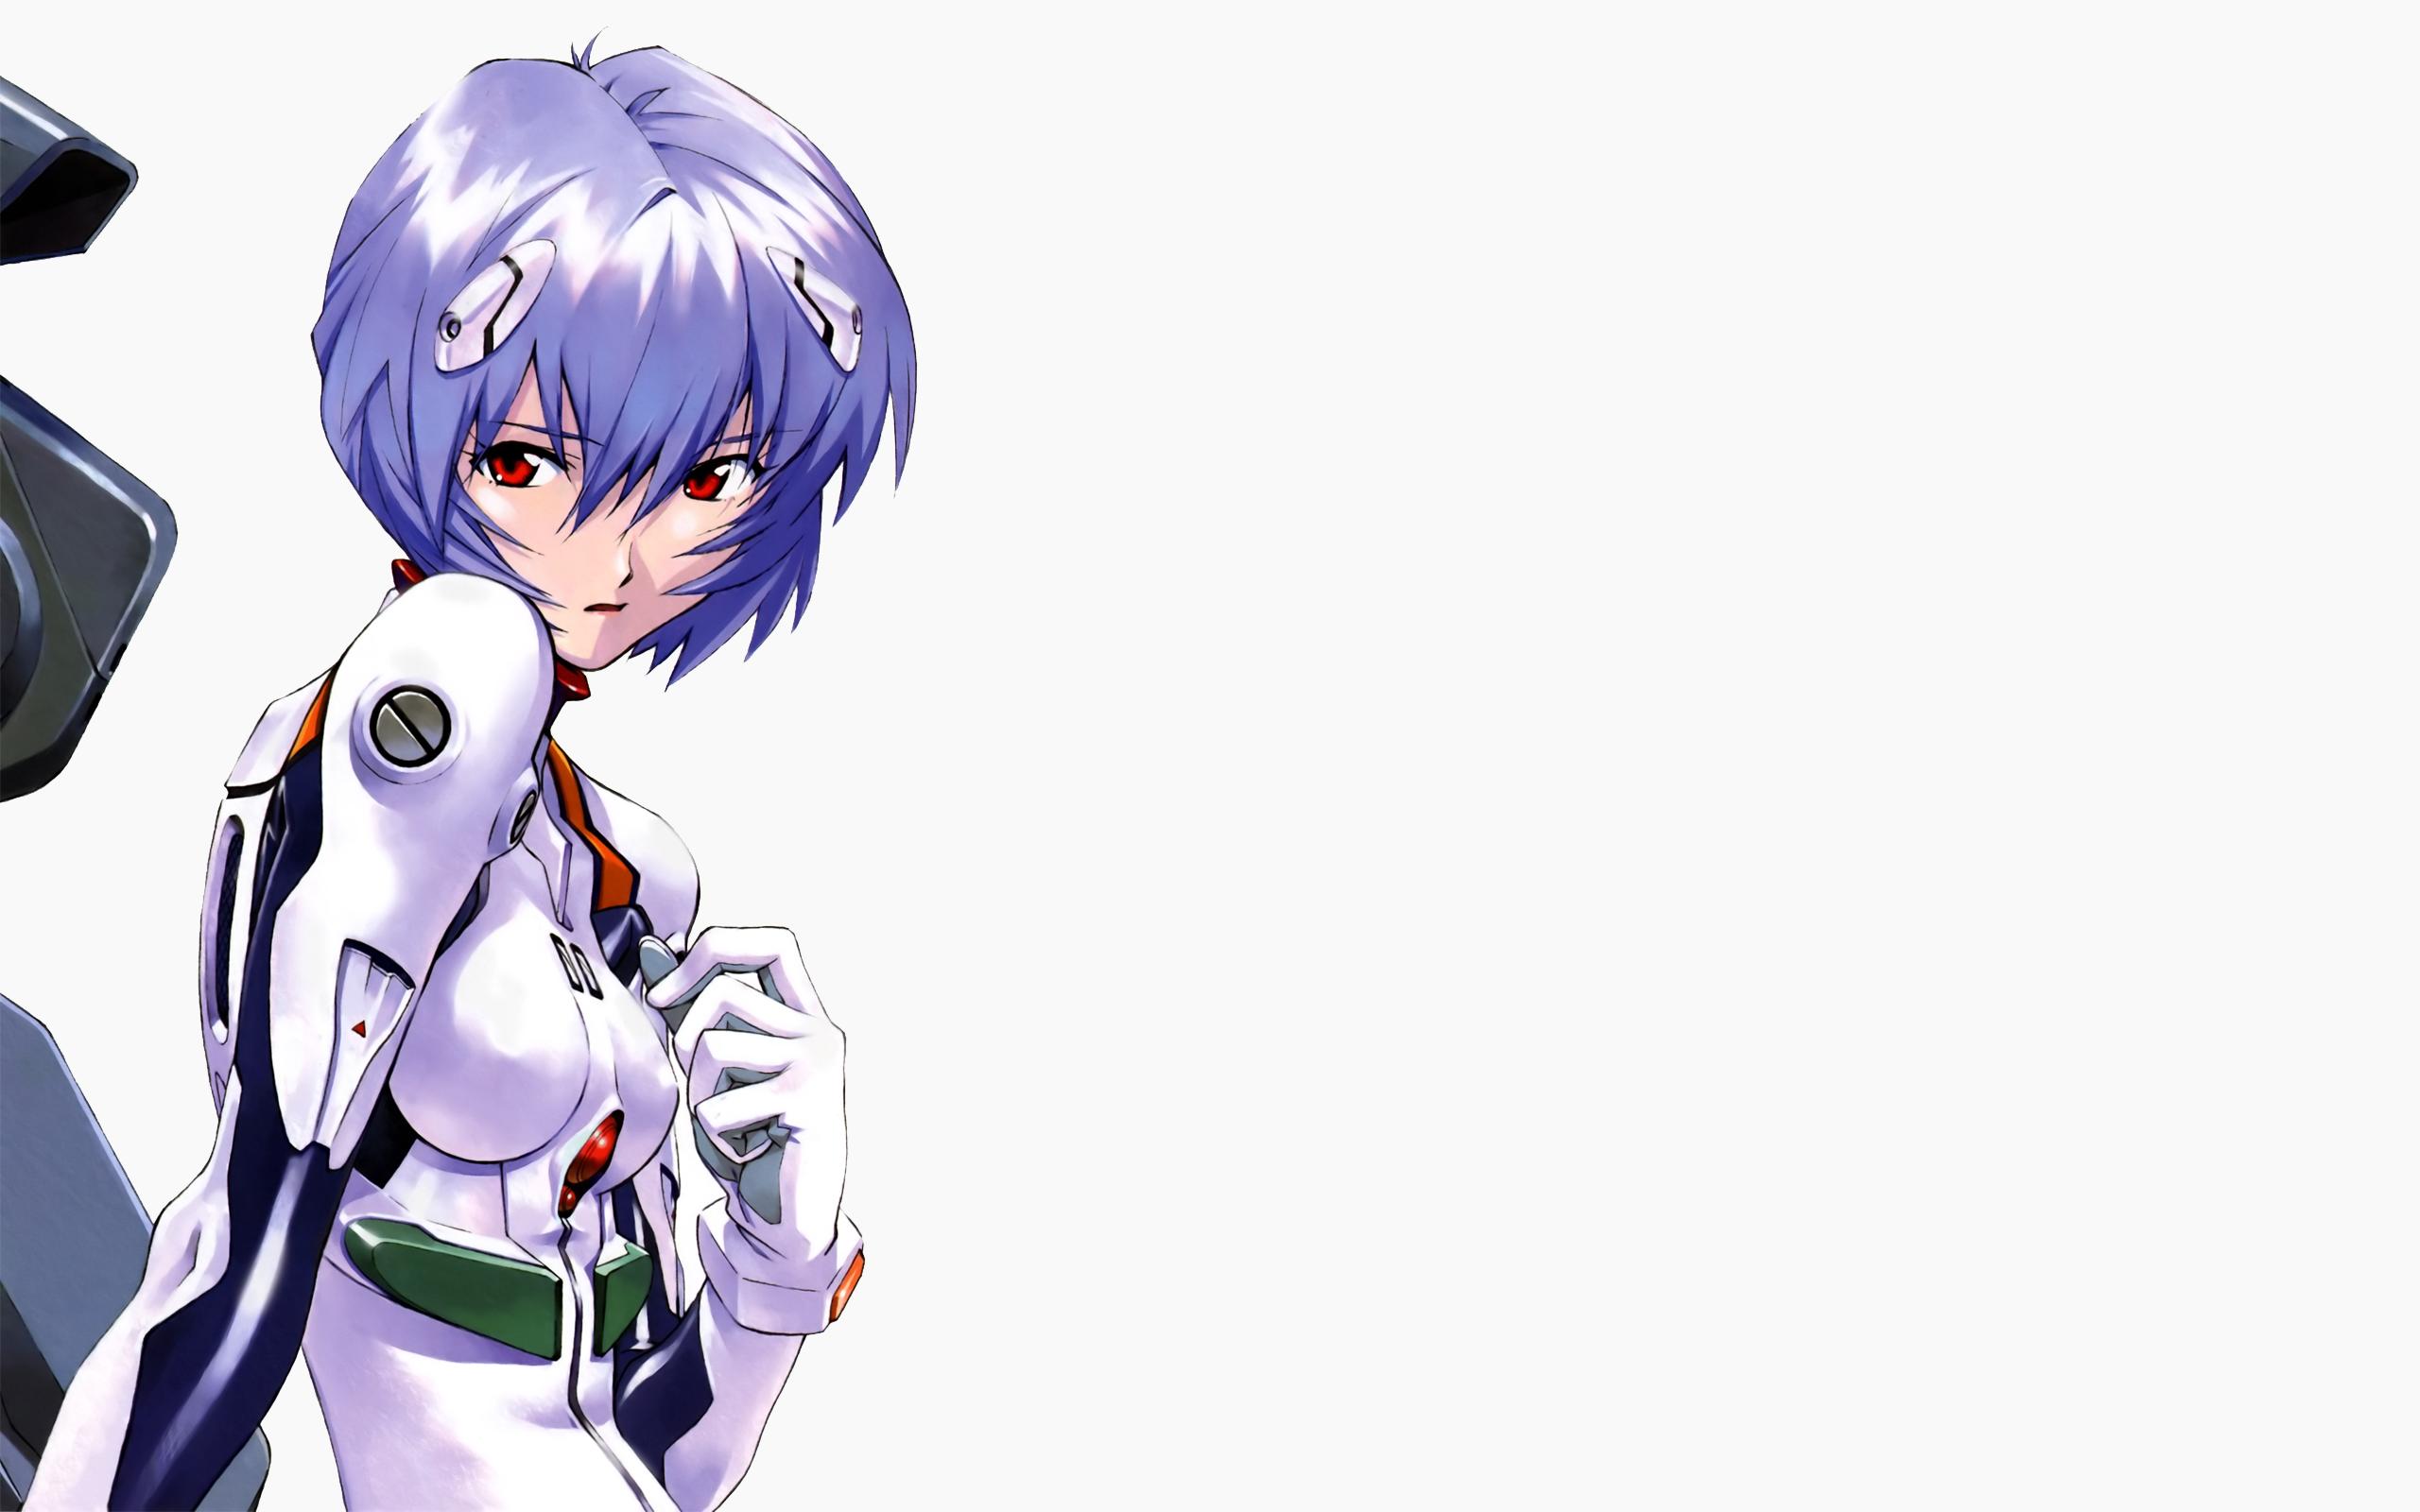 Anime - Neon Genesis Evangelion  Rei Ayanami Rei Evangelion Wallpaper